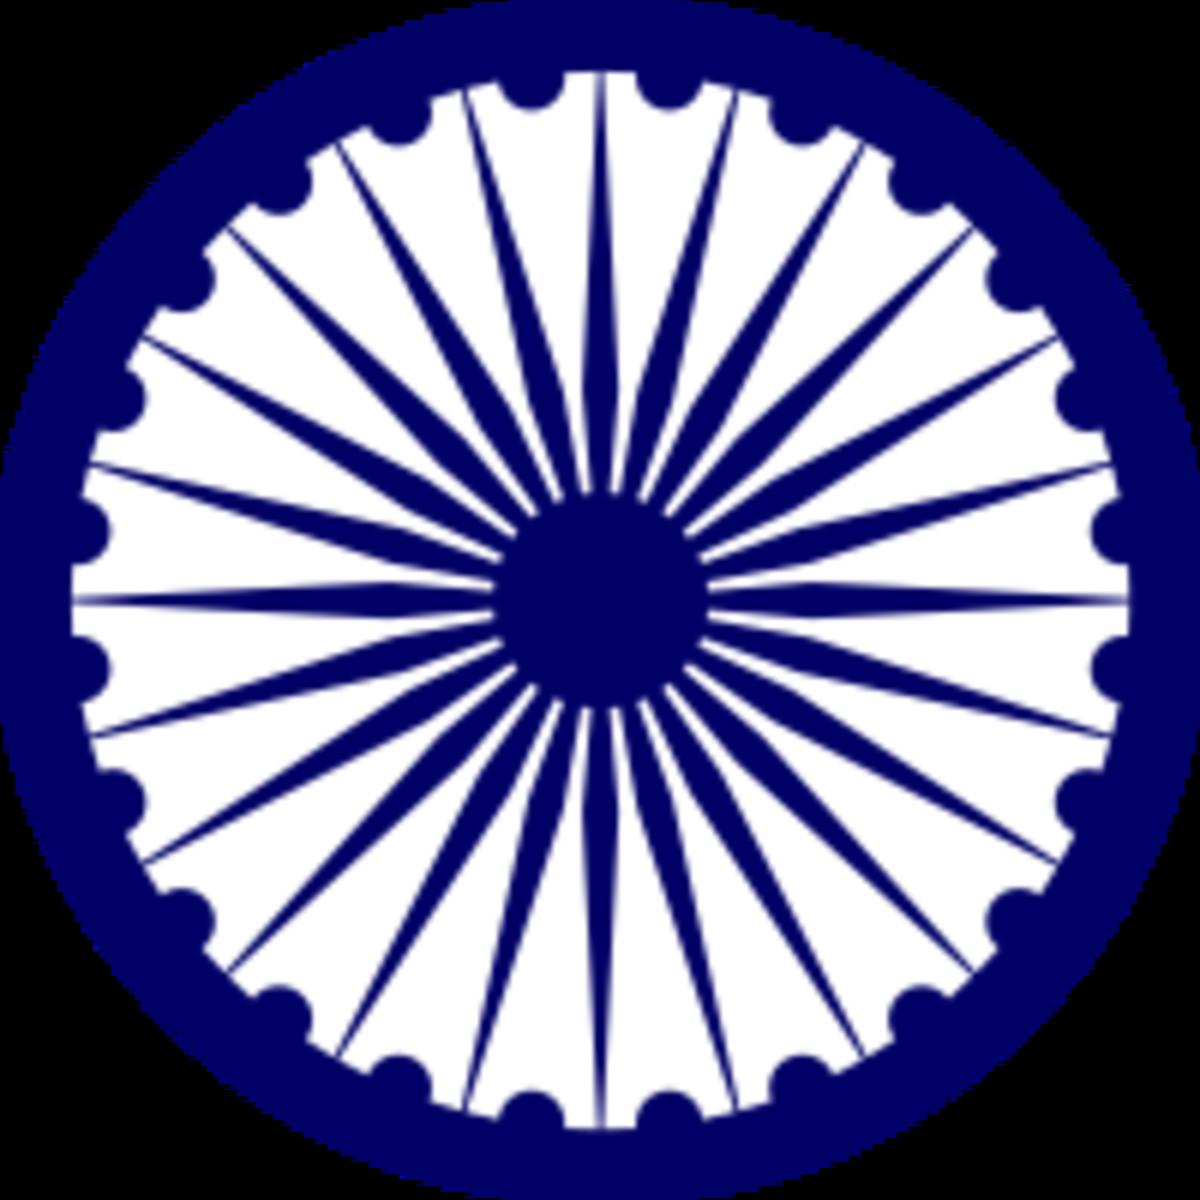 The Ashoka Chakra, known as the wheel of Dharma (Chakra means wheel)